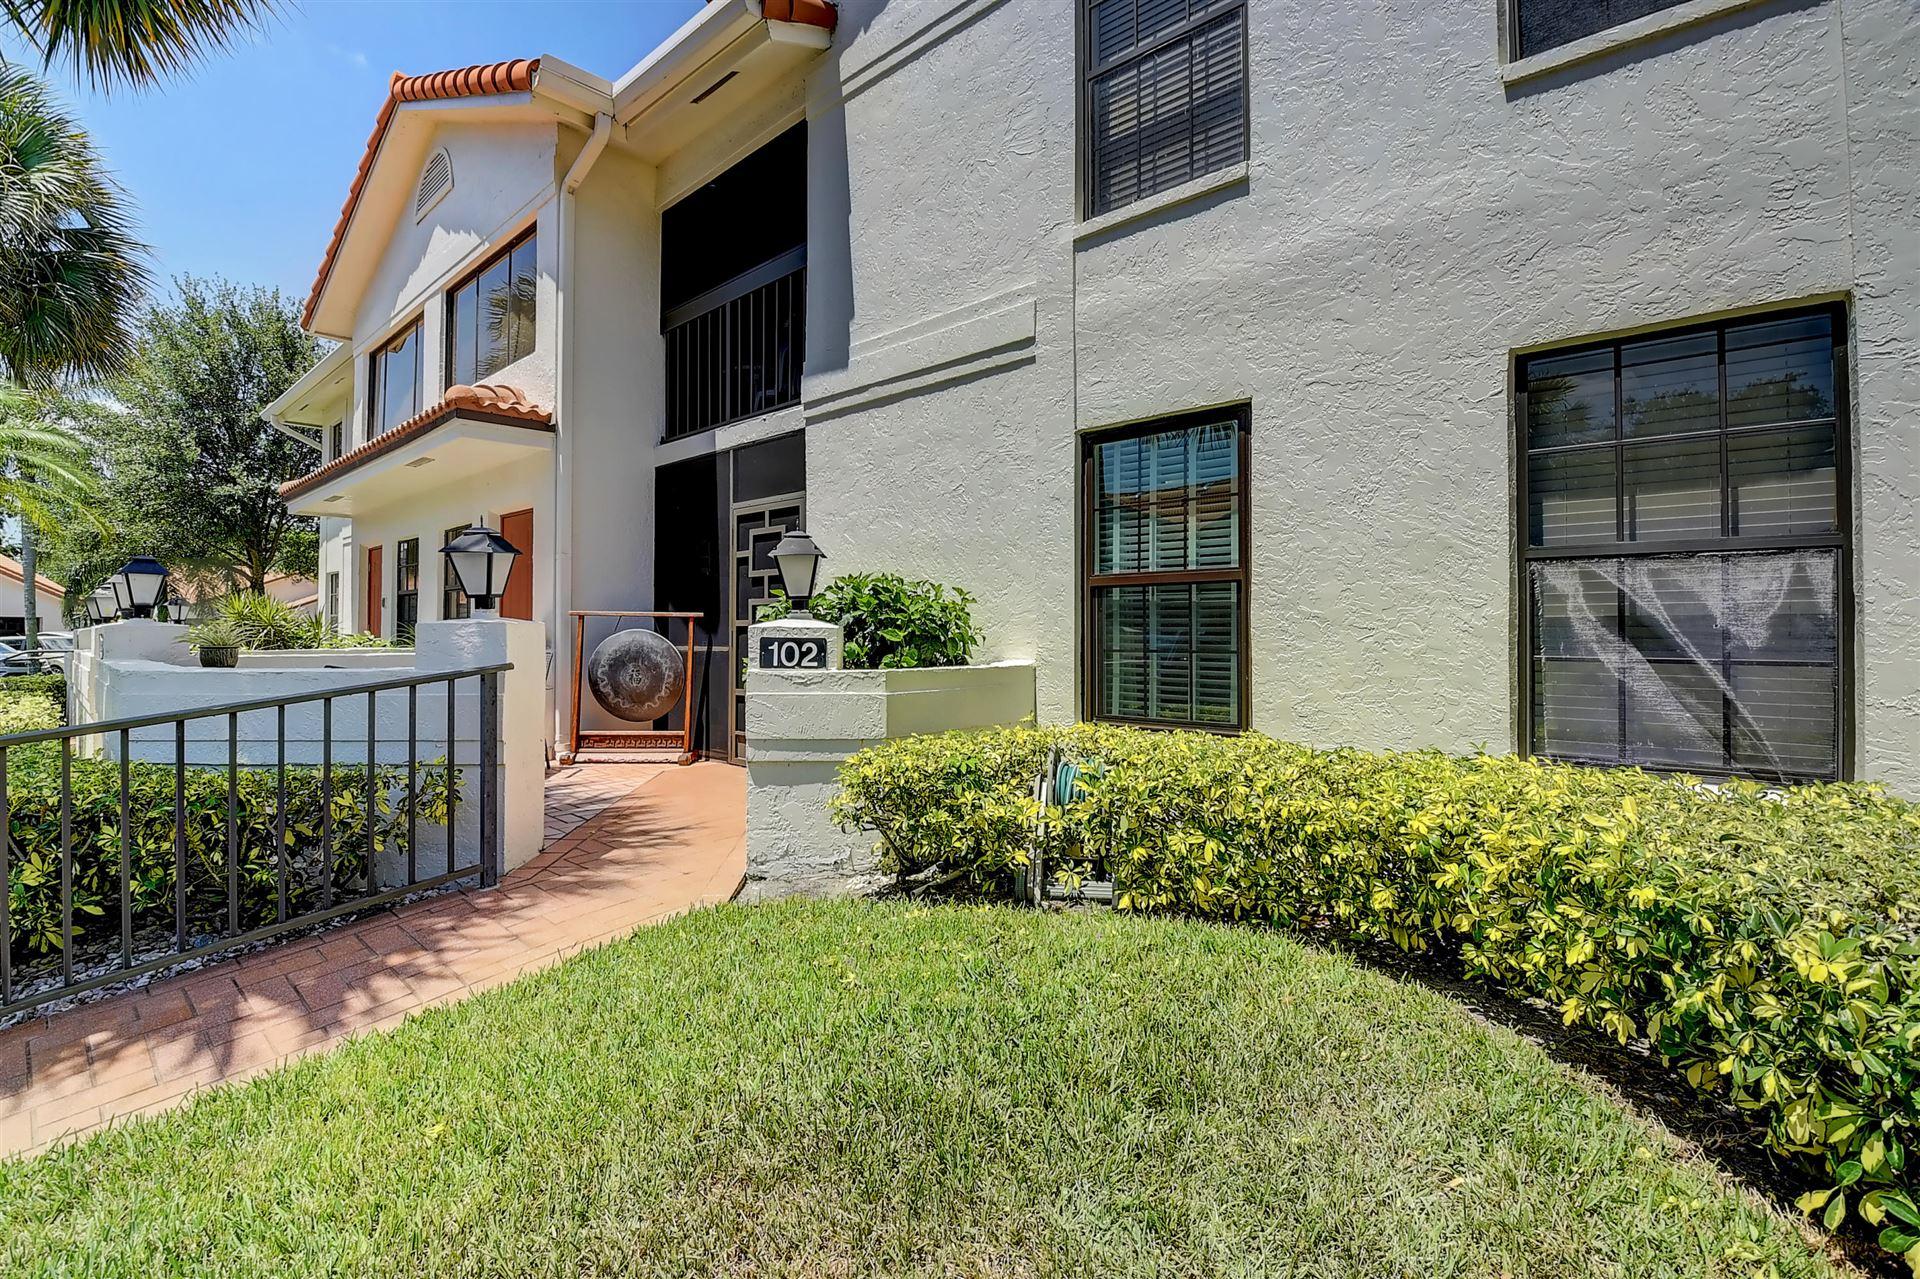 9729 Sills Drive E #102, Boynton Beach, FL 33437 - MLS#: RX-10719129